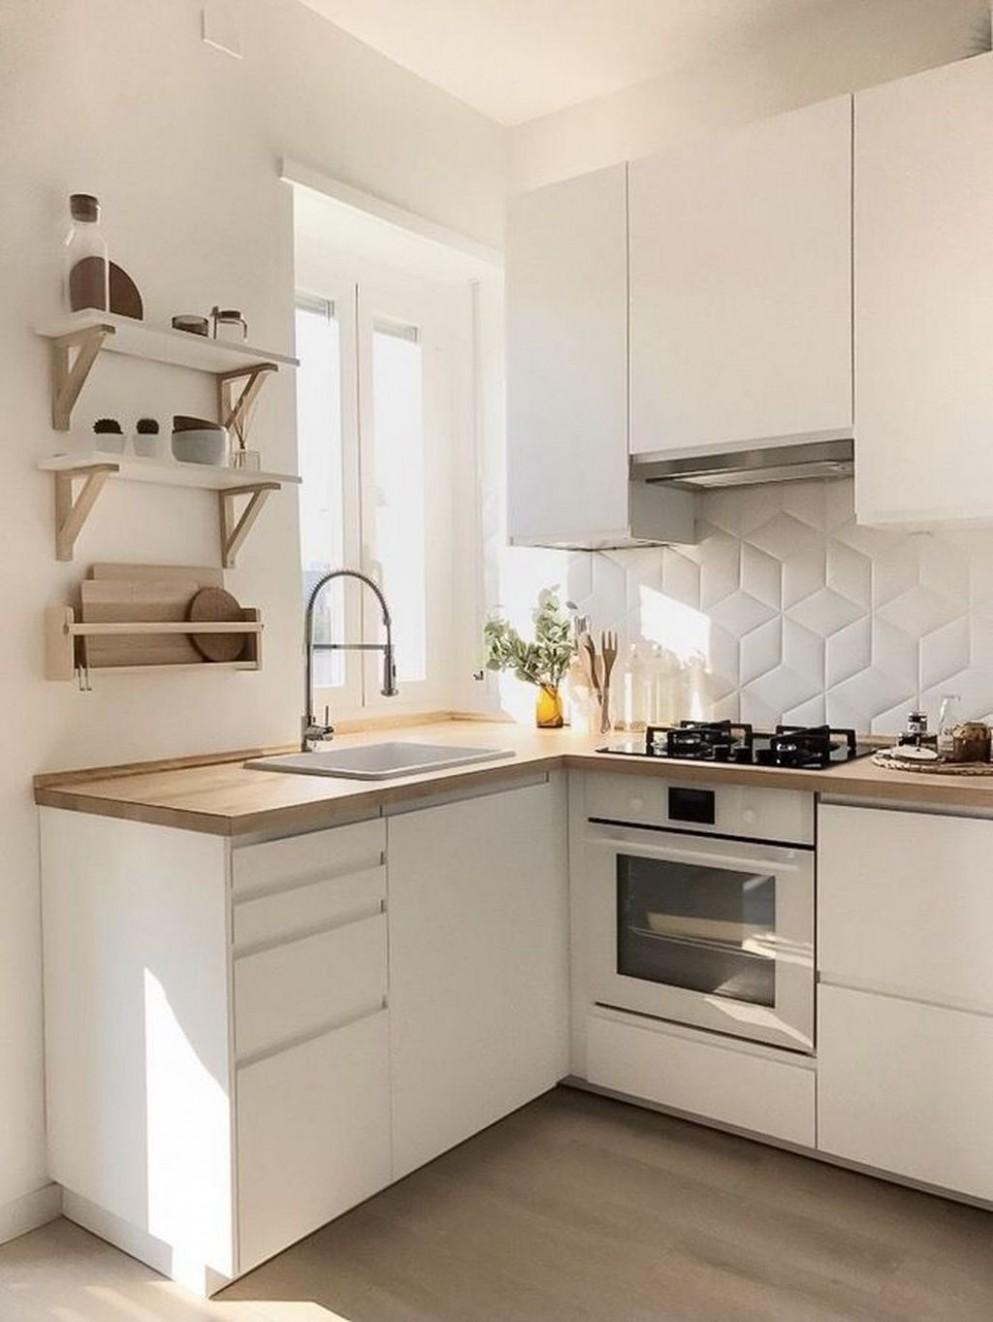 10+ Amazing Small Apartment Kitchen Ideas in 10  Small  - Apartment Kitchen Design